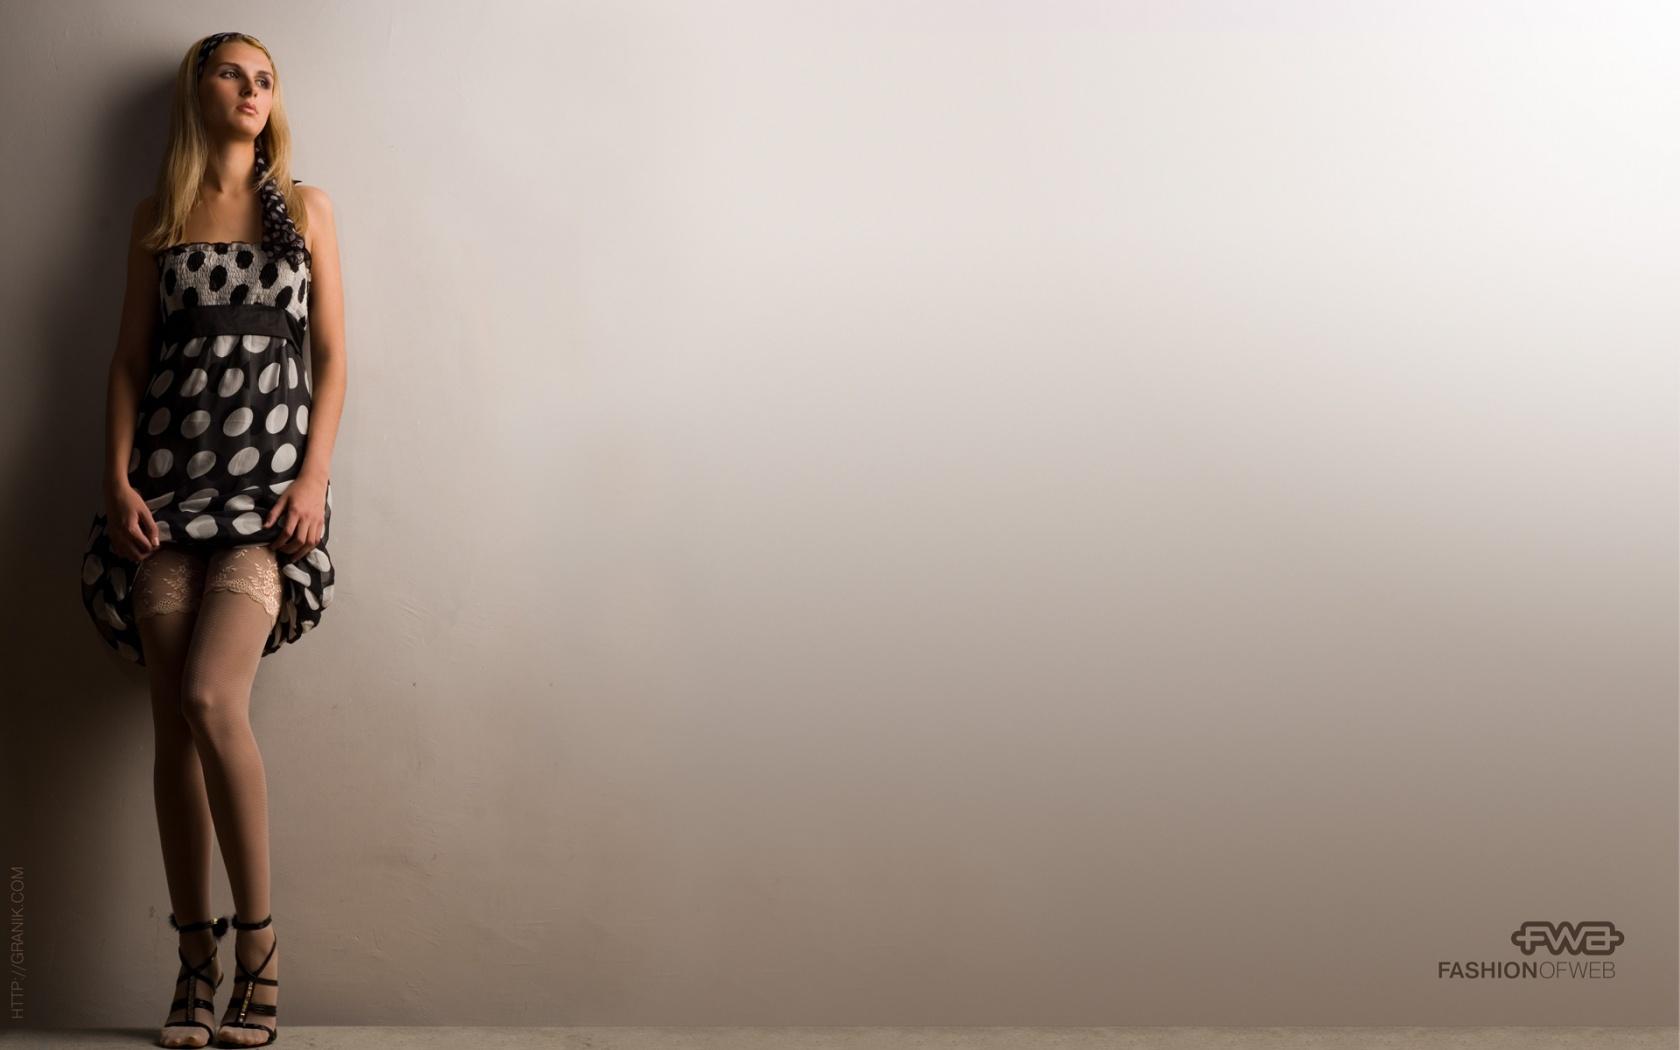 fashion clothes wallpaper - photo #19